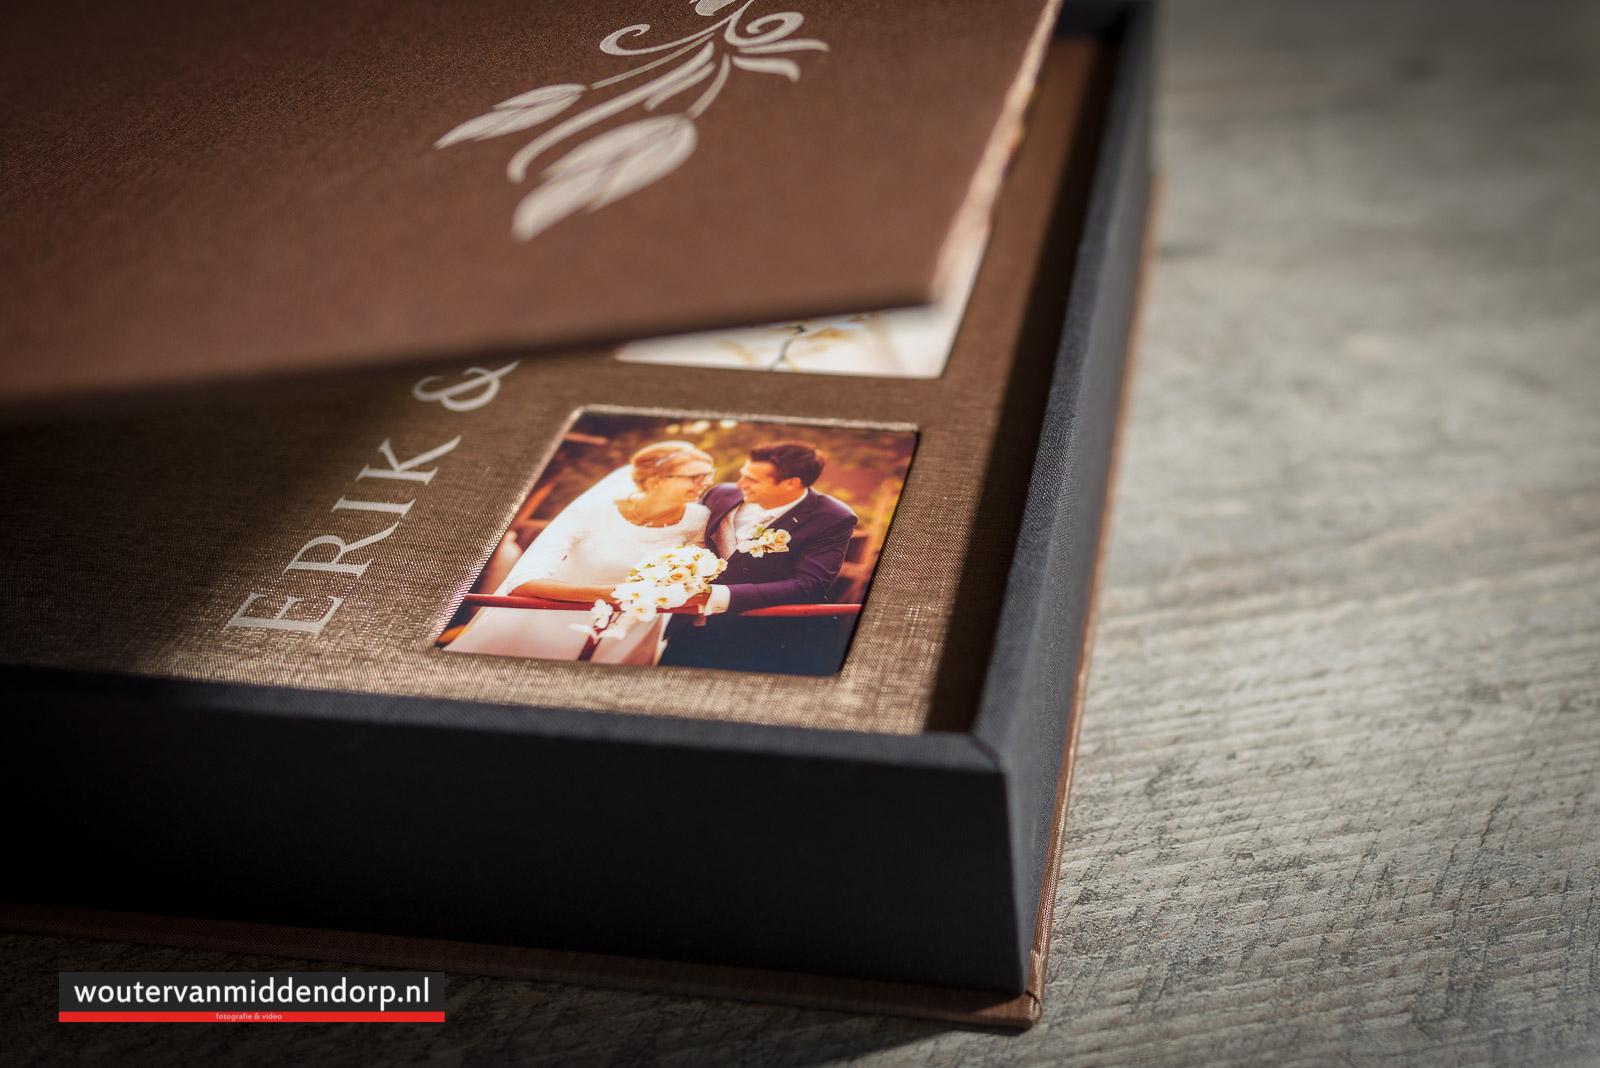 trouwalbum, bruidsreportage, fotograaf Wouter van Middendorp Uddel-11